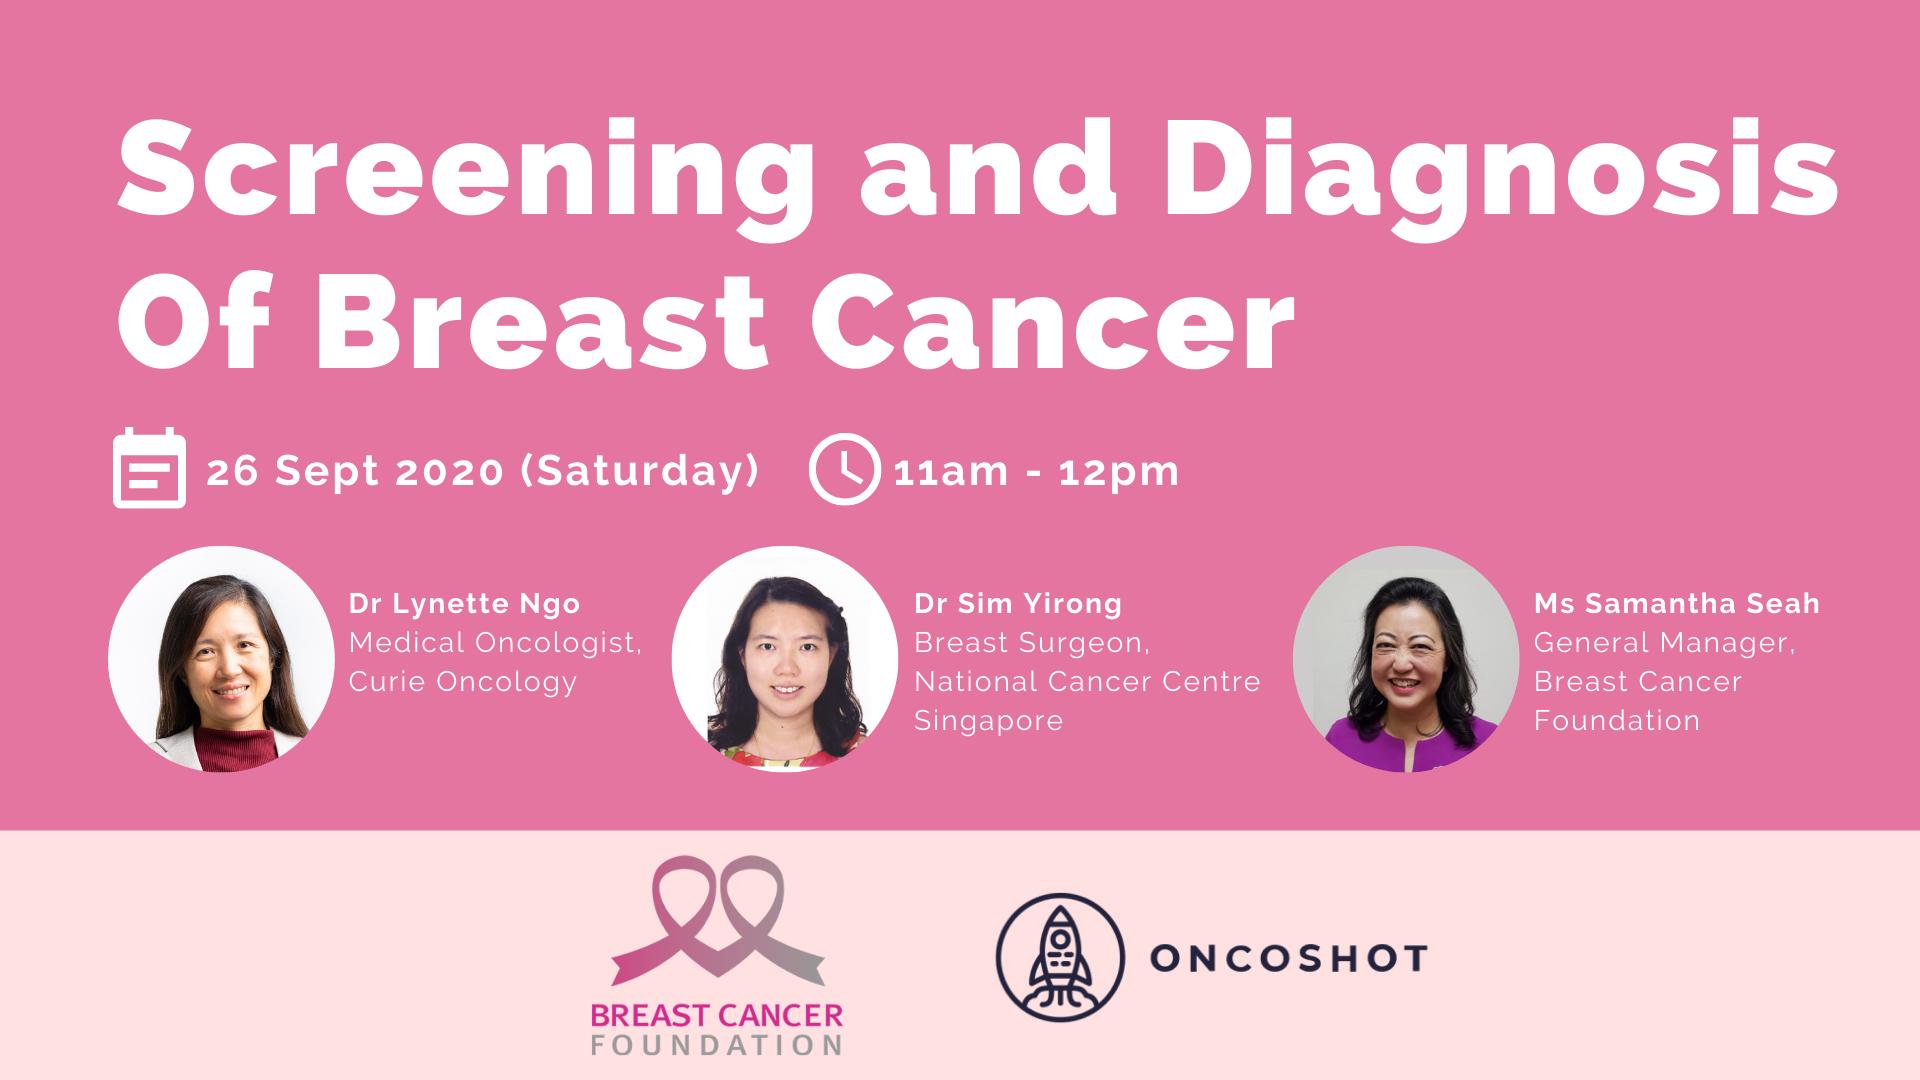 Screening and Diagnosis of Breast Cancer (Webinar)